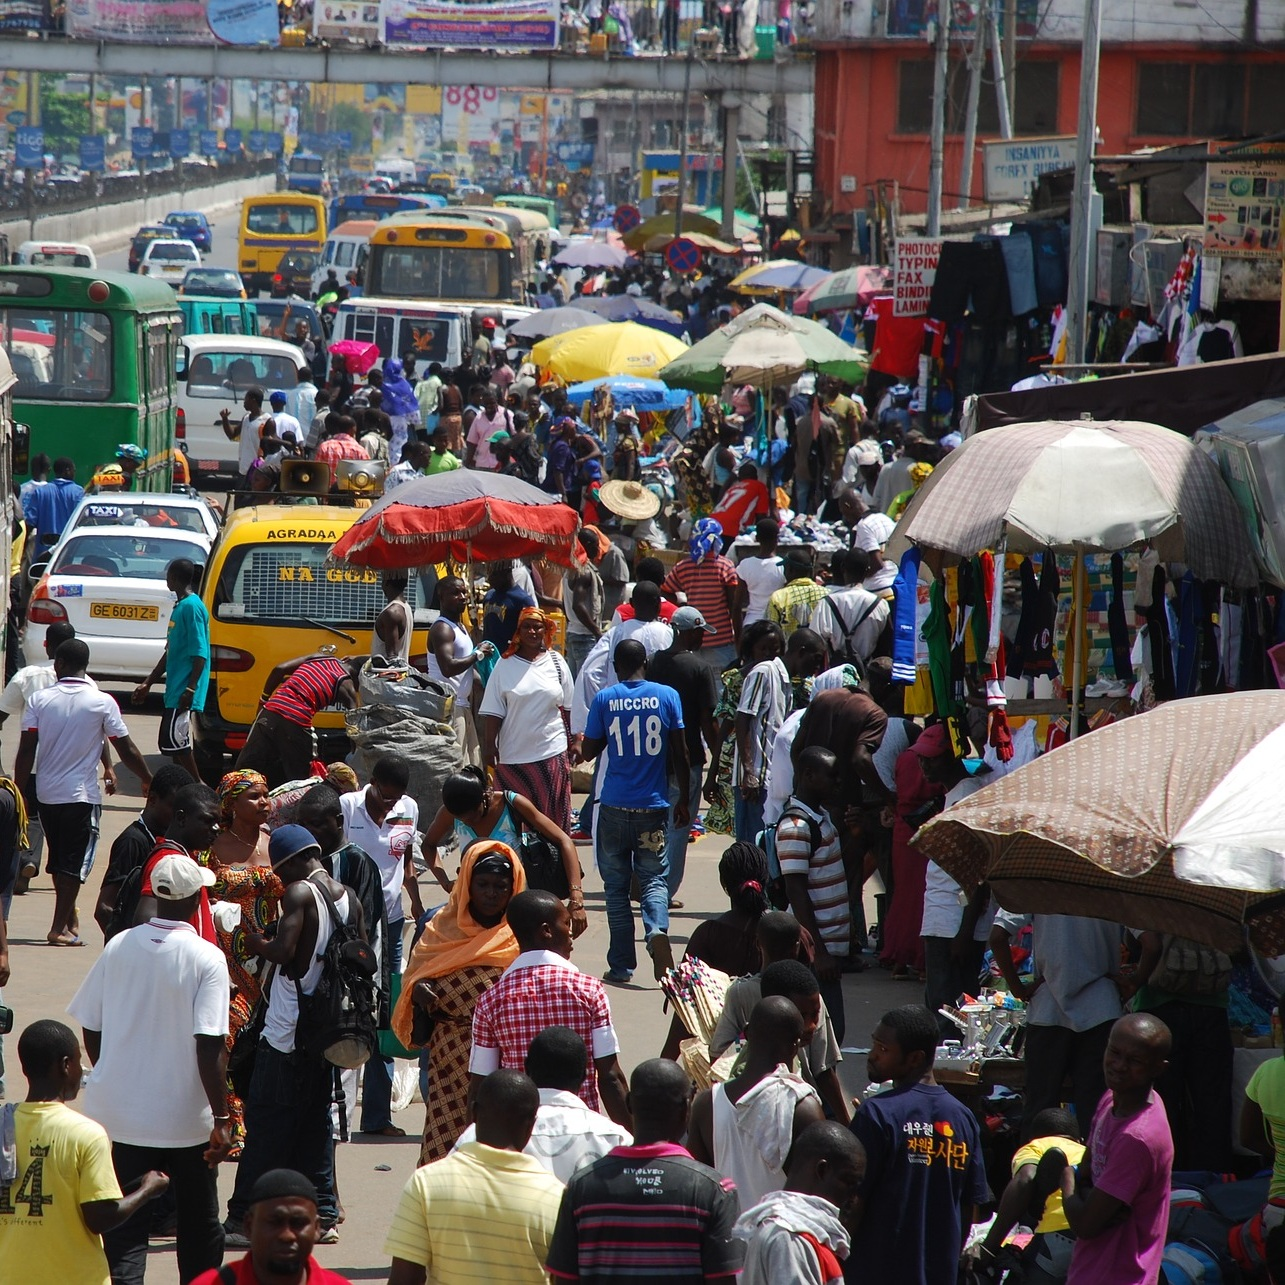 Street+in+Ghana.jpg